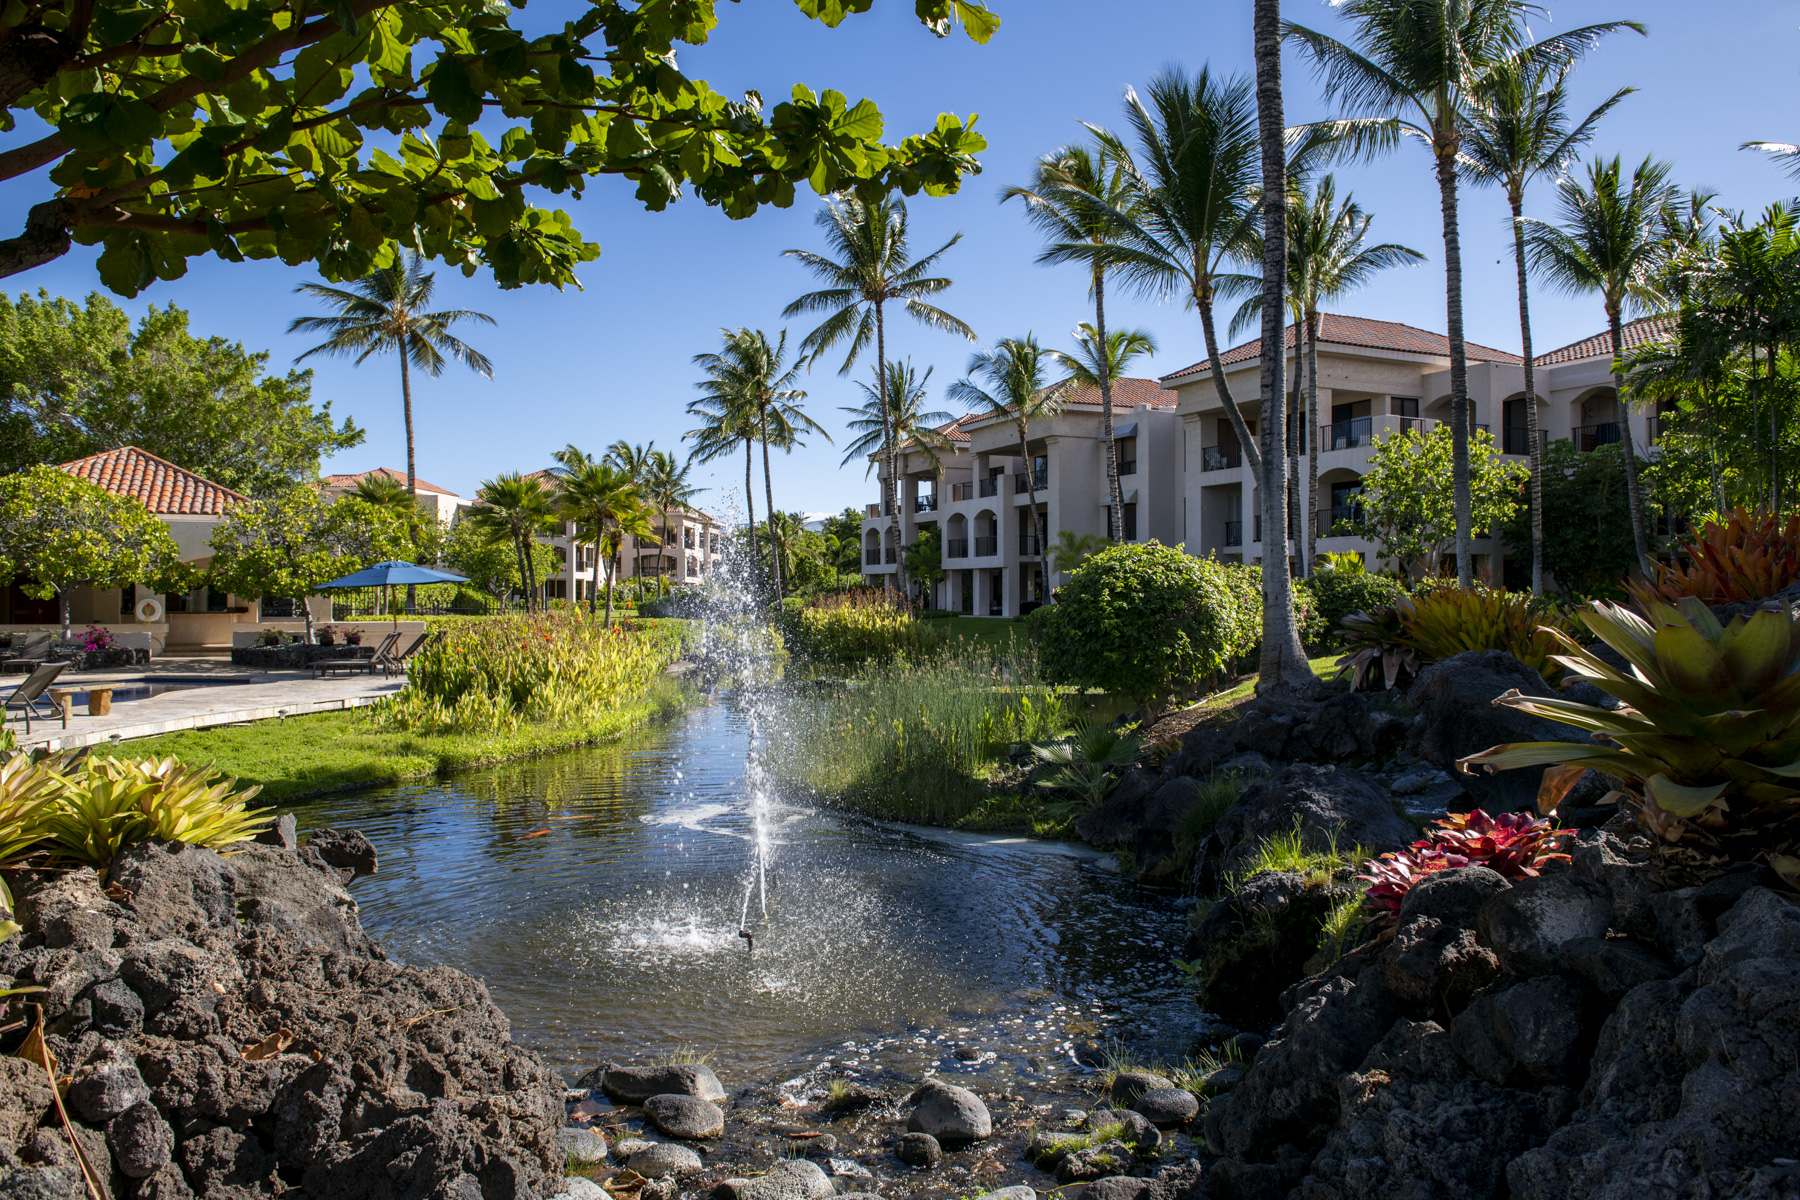 Condominiums 용 매매 에 69-1035 Keana Place, Waikoloa Village, HI 96738 Waikoloa, 하와이 96738 미국